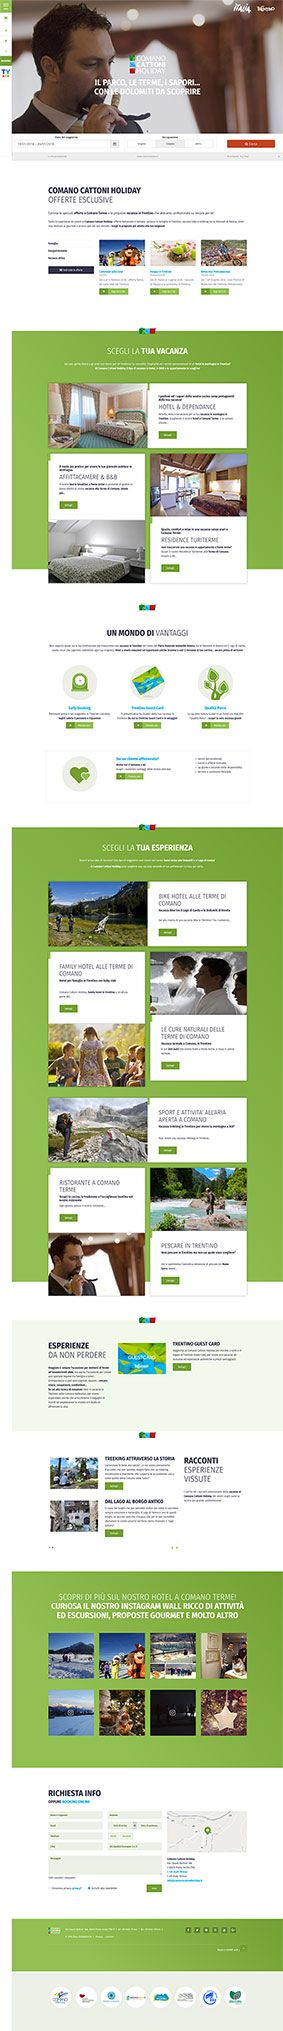 #comanocattoniholiday www.comanocattoniholiday.it #kumbe #webdesign #portfolio #hotel #cattoni #holiday #vacanza #outdoor #terme #dolomiti #sapori #tradizioni #offerte #dependance #affittacamere #bedandbreakfast #residence #booking #esperienza #bike #natura #fishing #comanoterme #comano #trentino